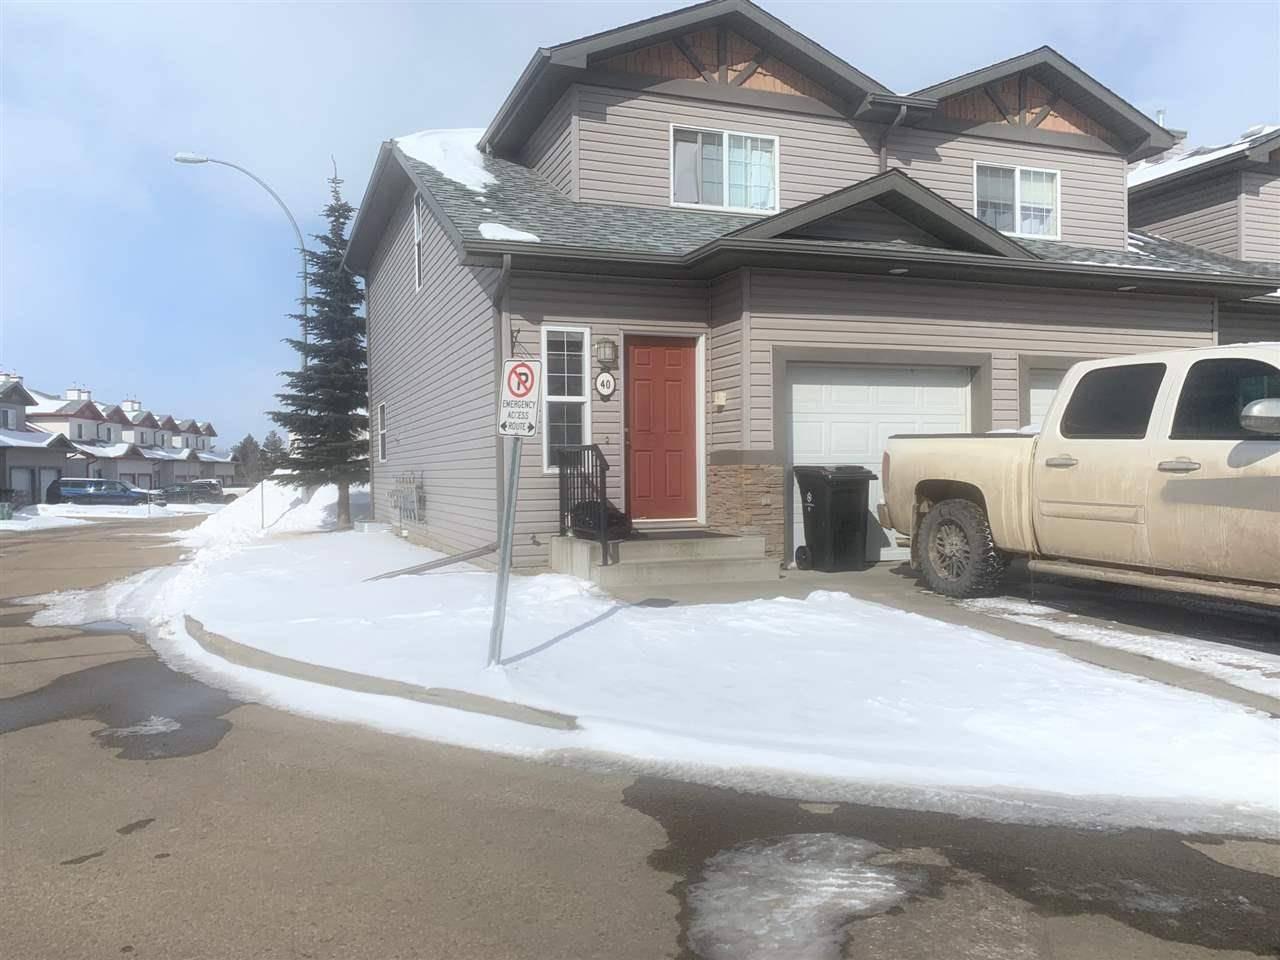 Townhouse for sale at 15 Woodsmere Cs Fort Saskatchewan Alberta - MLS: E4192994